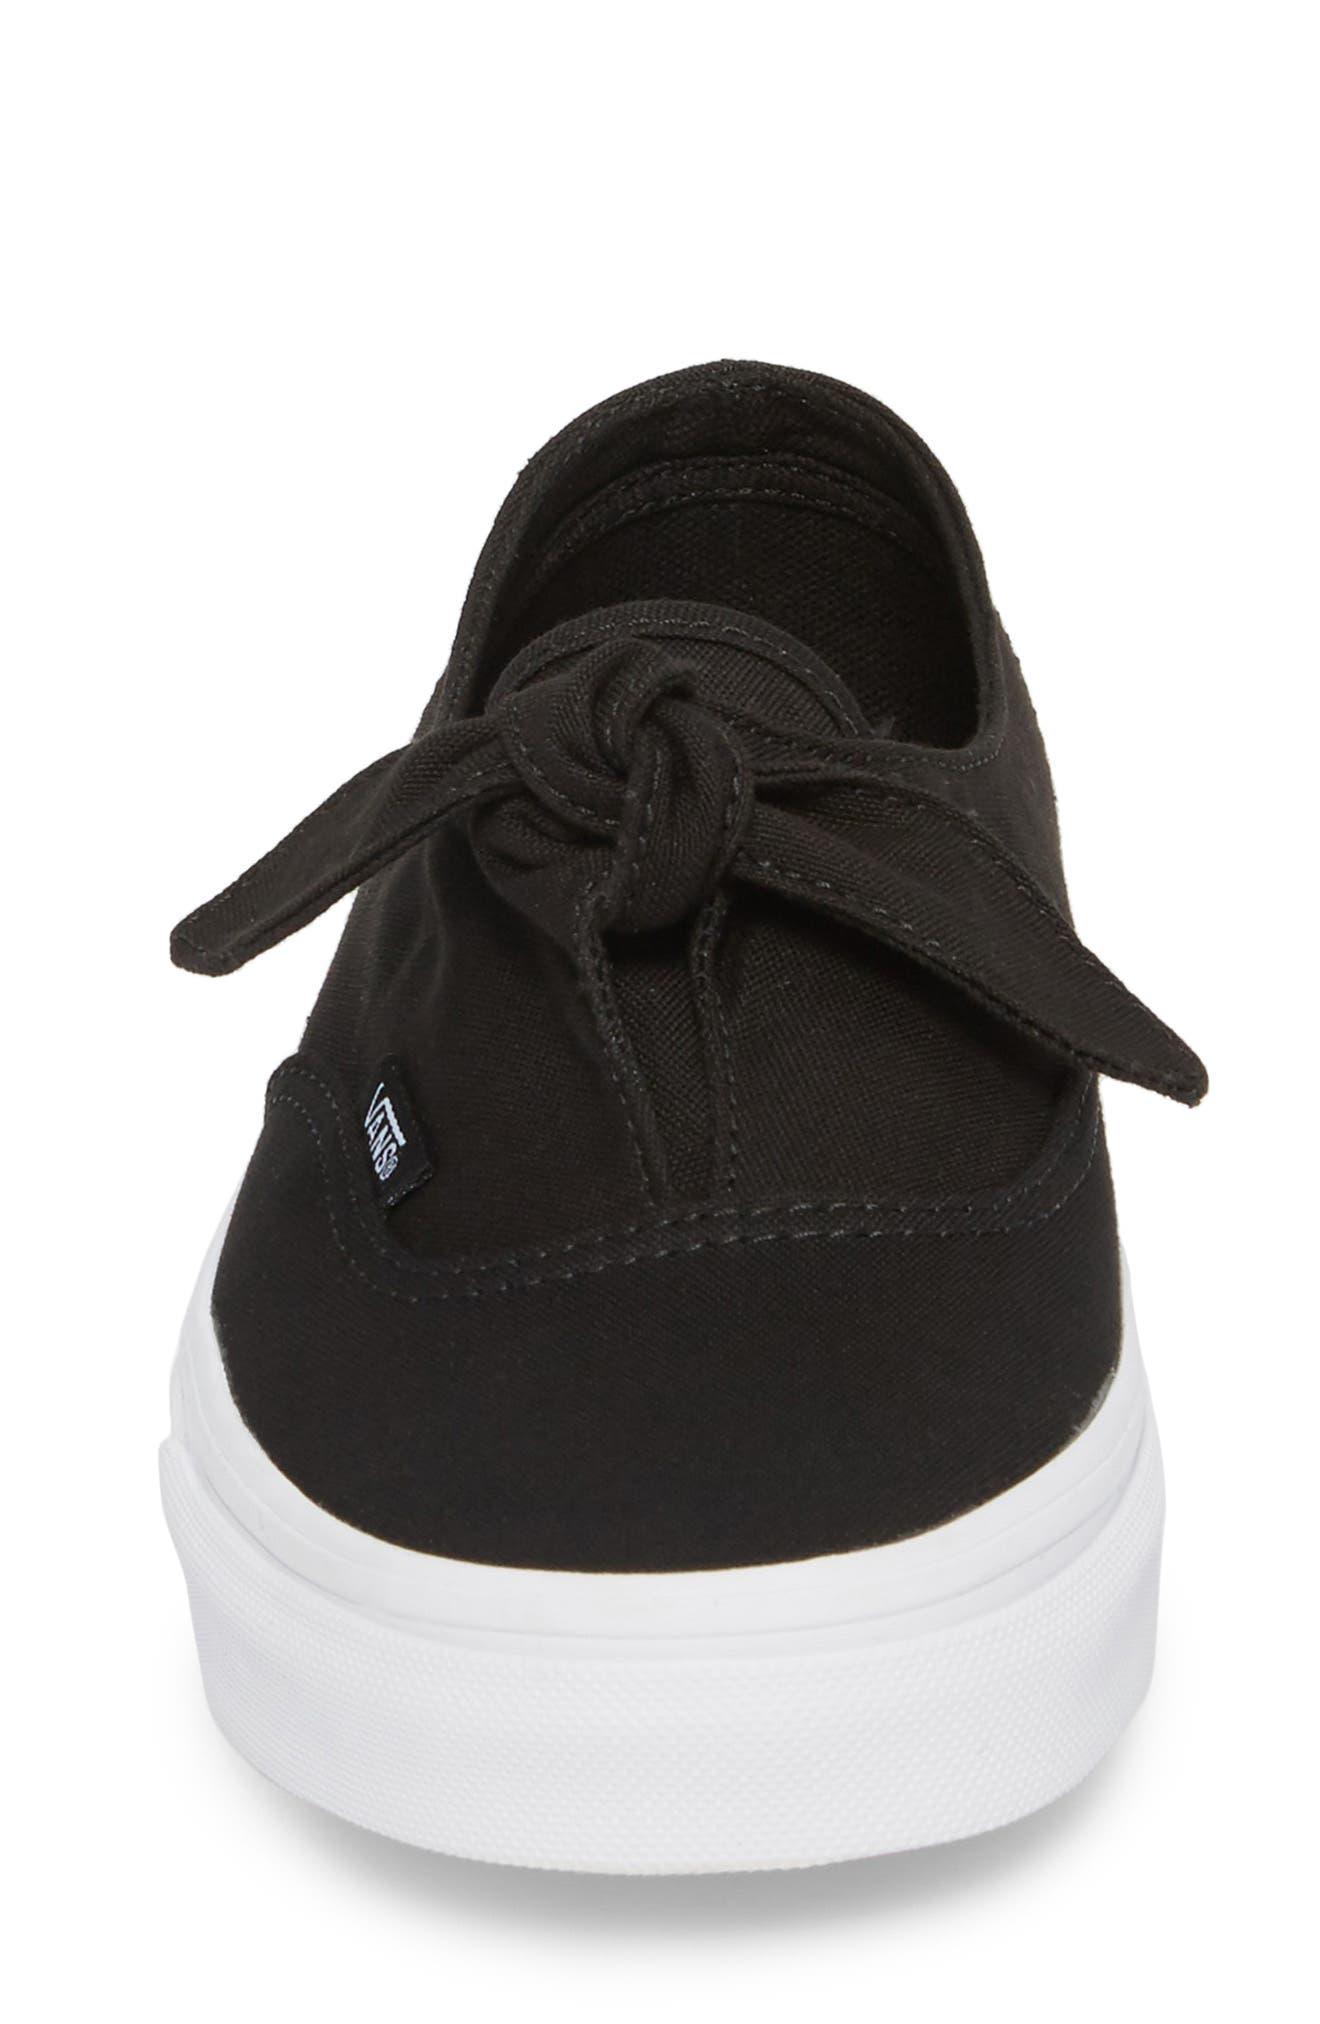 Alternate Image 4  - Vans UA Authentic Knotted Slip-On Sneaker (Women)